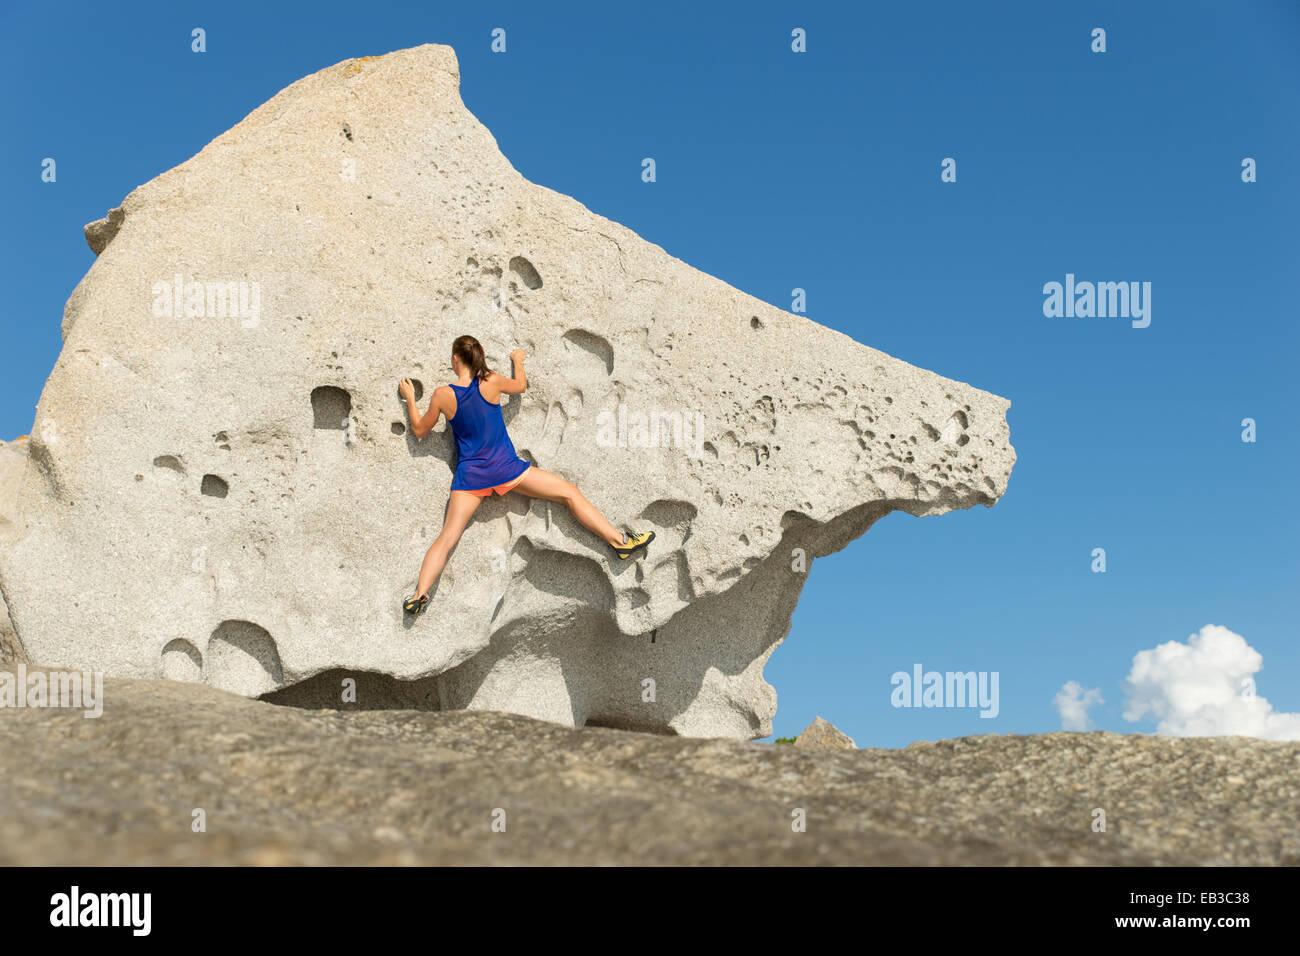 Rear view of a woman climbing a big rock, Corsica, France Stock Photo